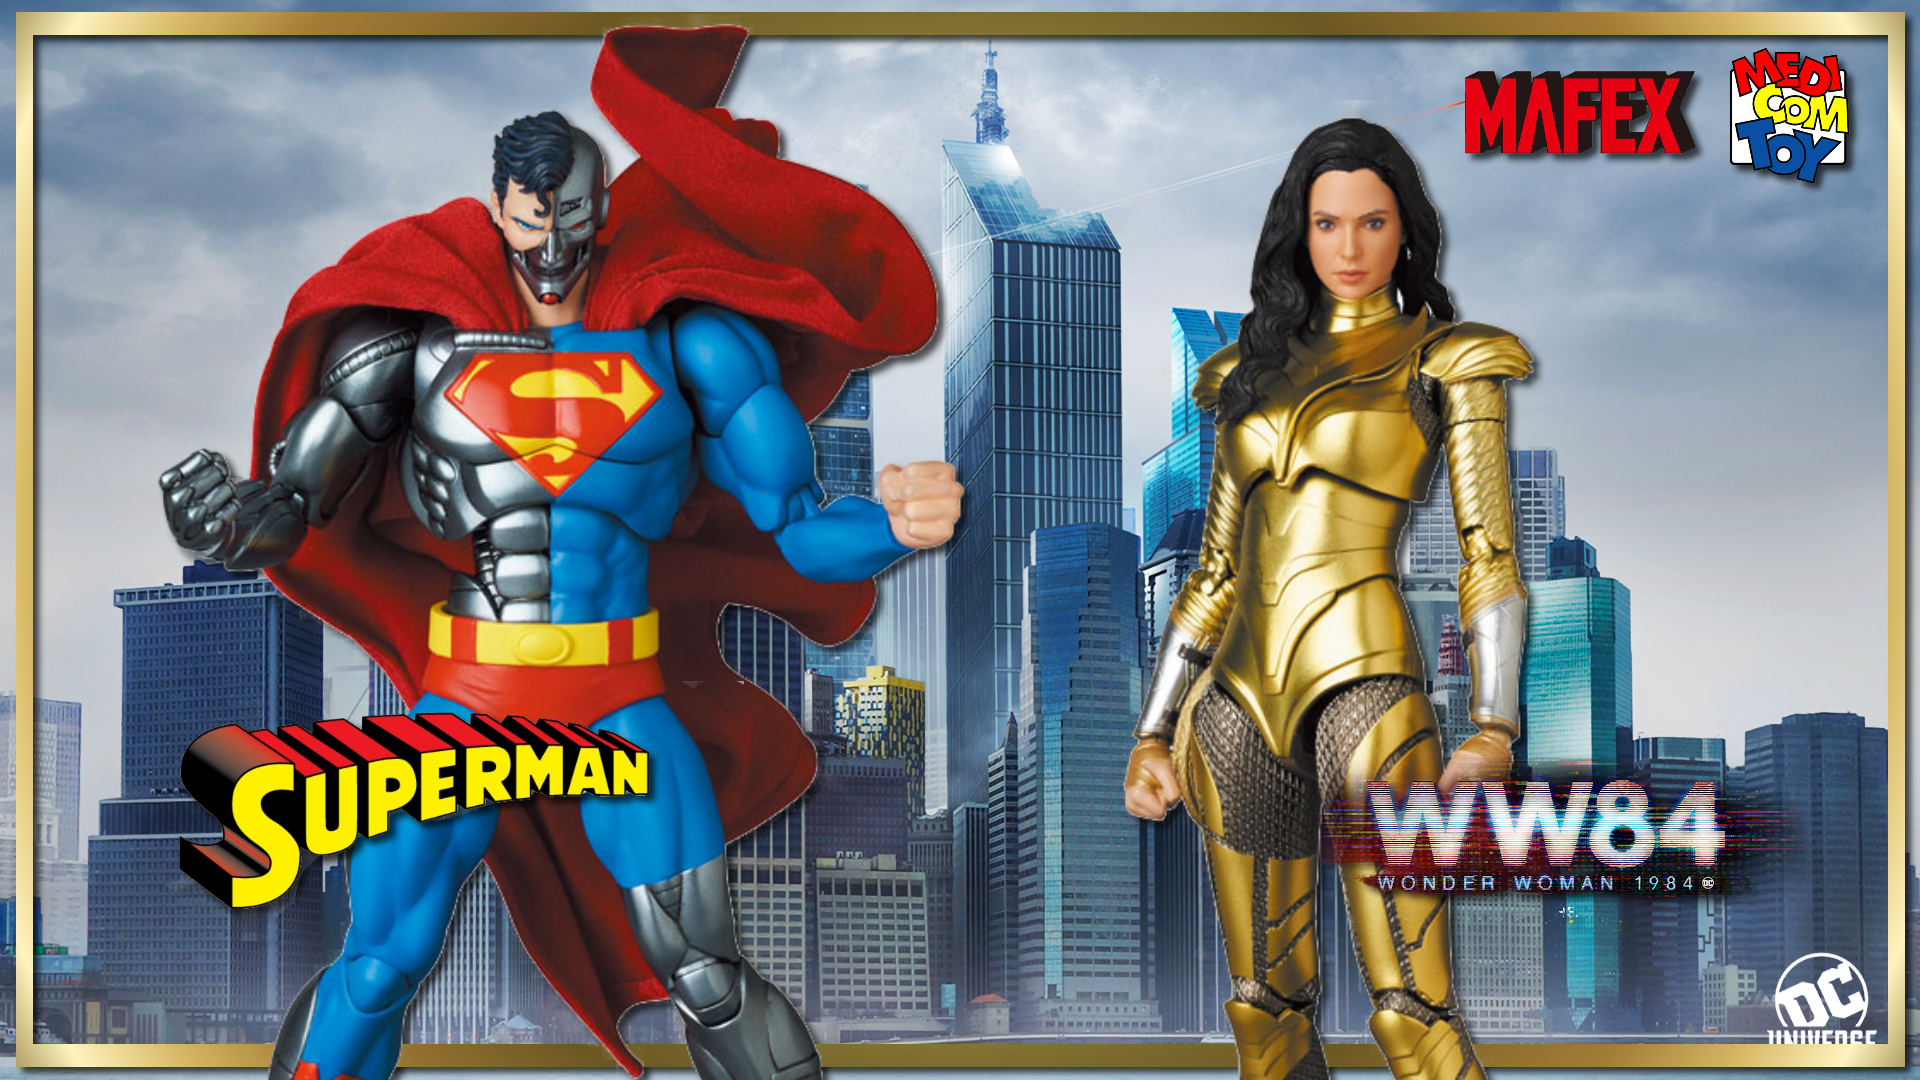 First Look | MAFEX Reveals New DC Comics Figures